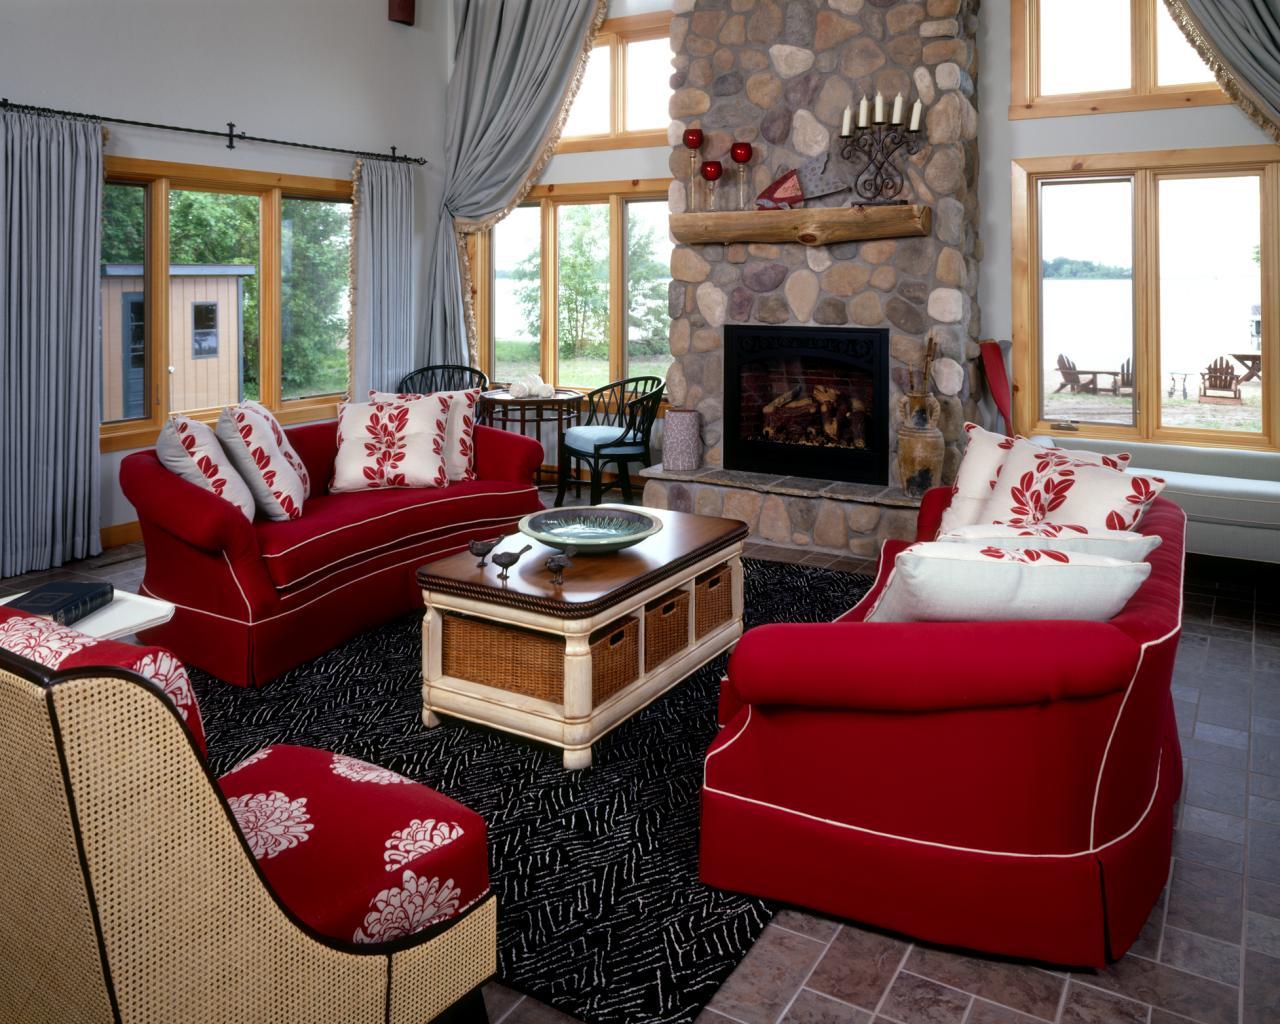 Vackra röda soffa vardagsrum idéer